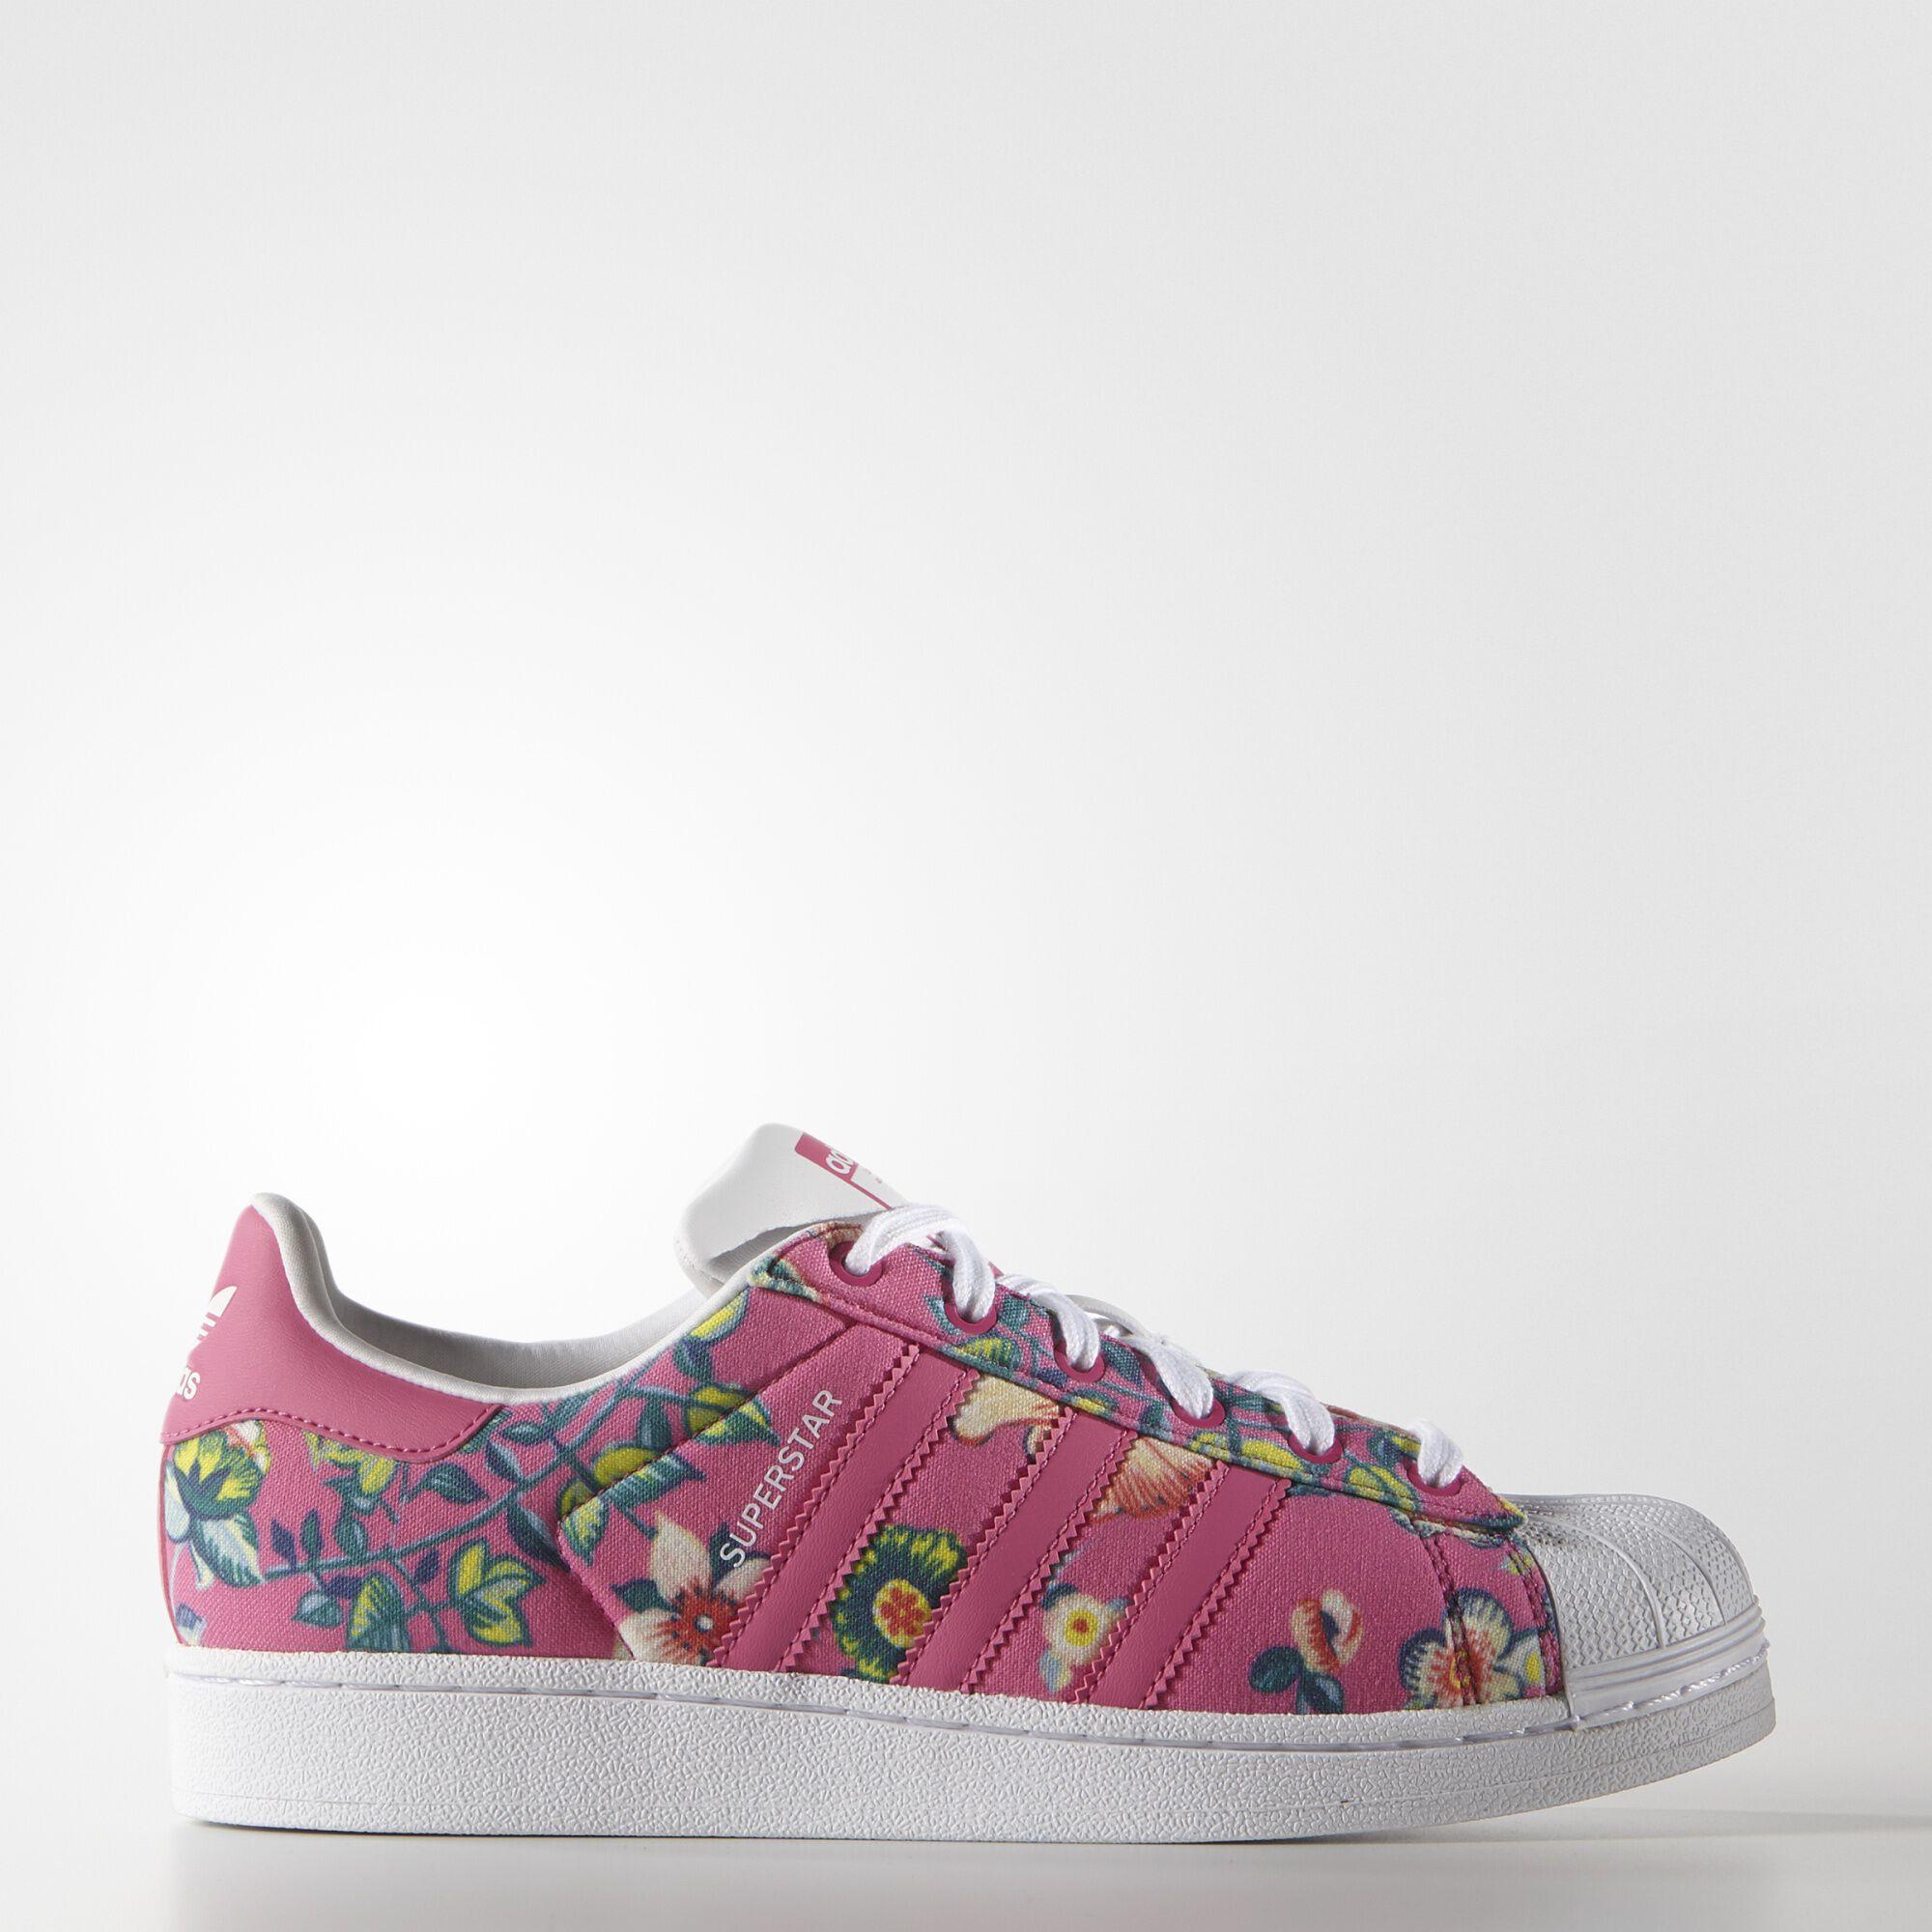 adidas rosas con flores